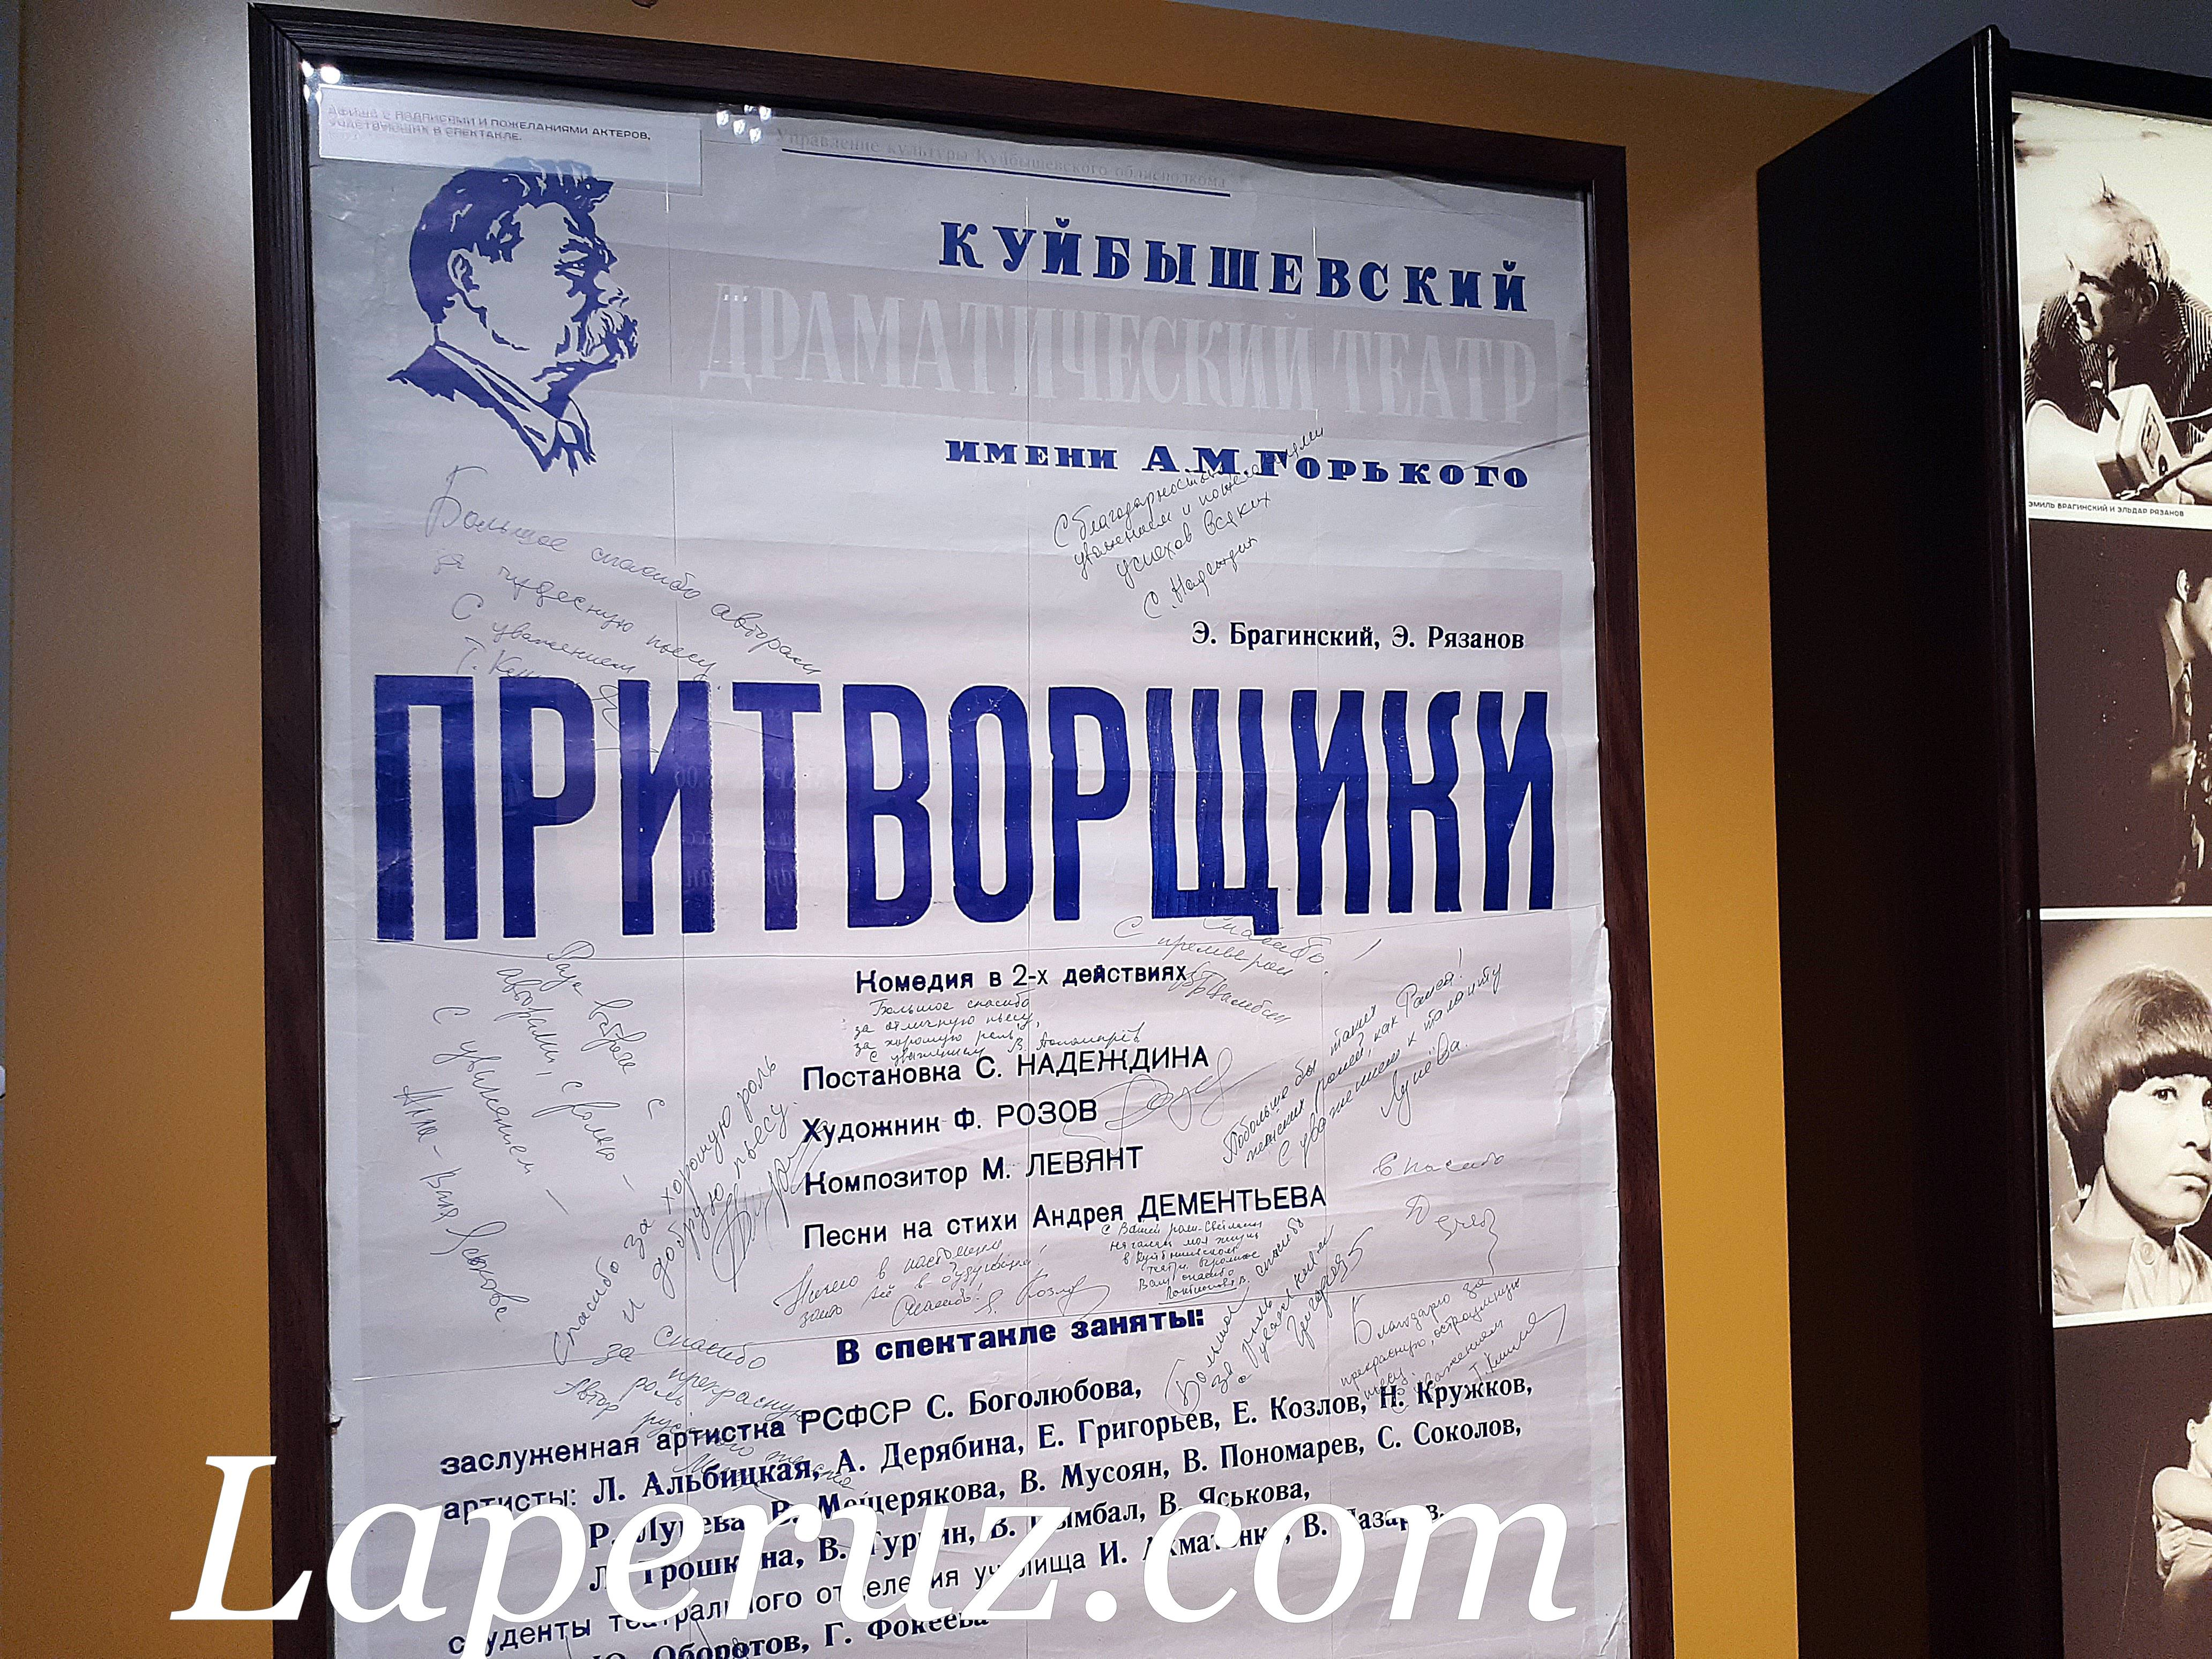 muzei_ryazanova_v_samare_25